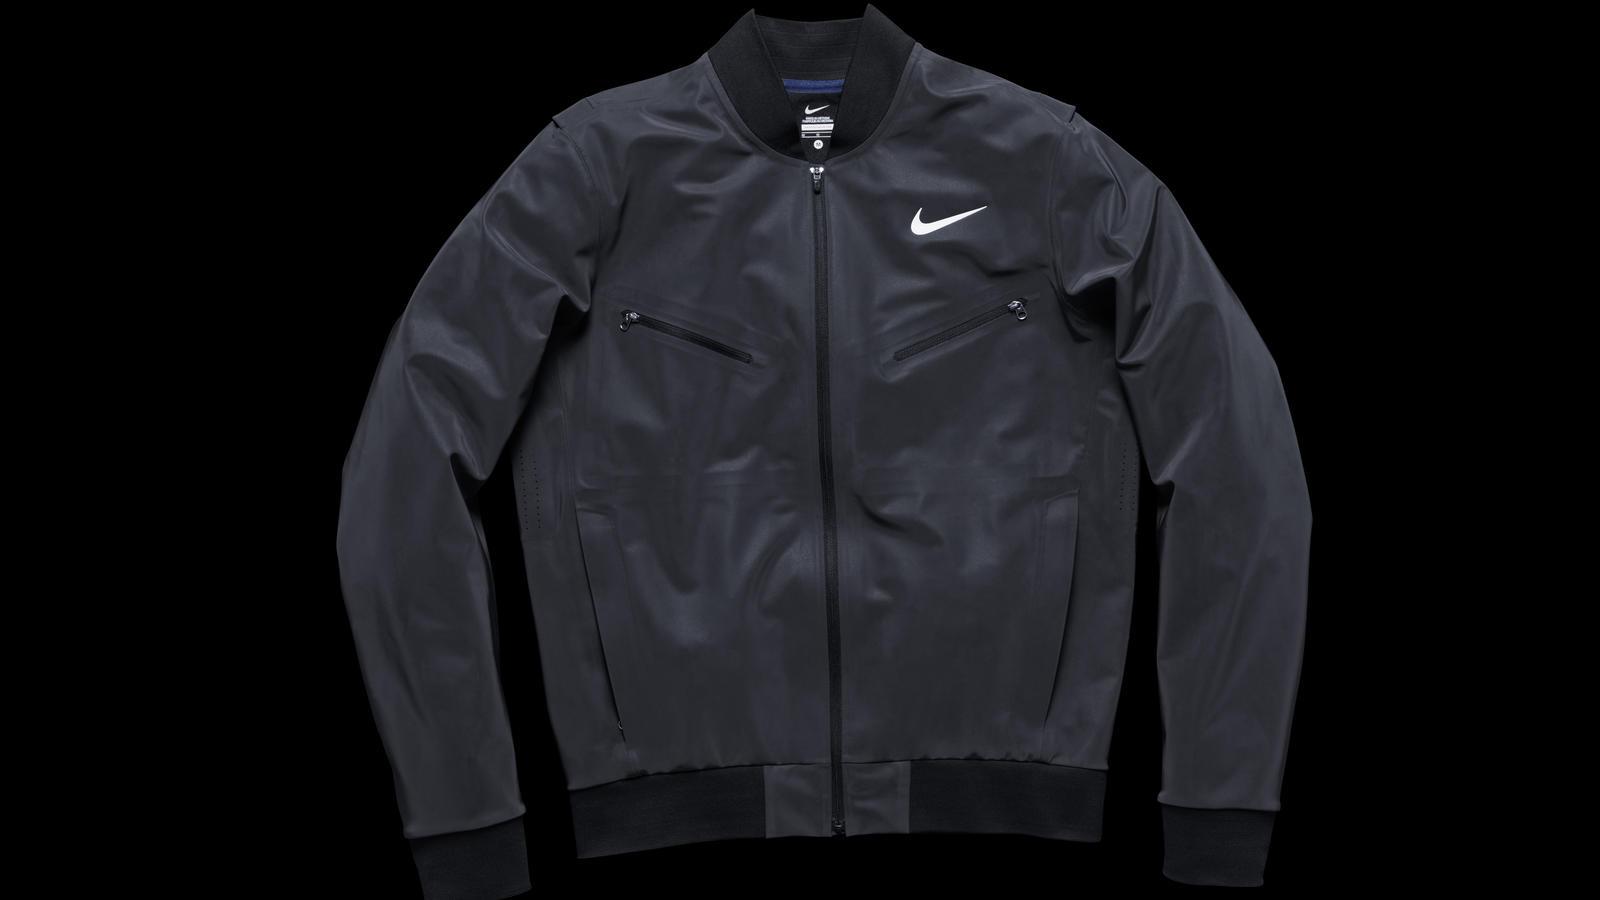 Nike Tennis Vapor Flash Rafa Jacket (without flash)